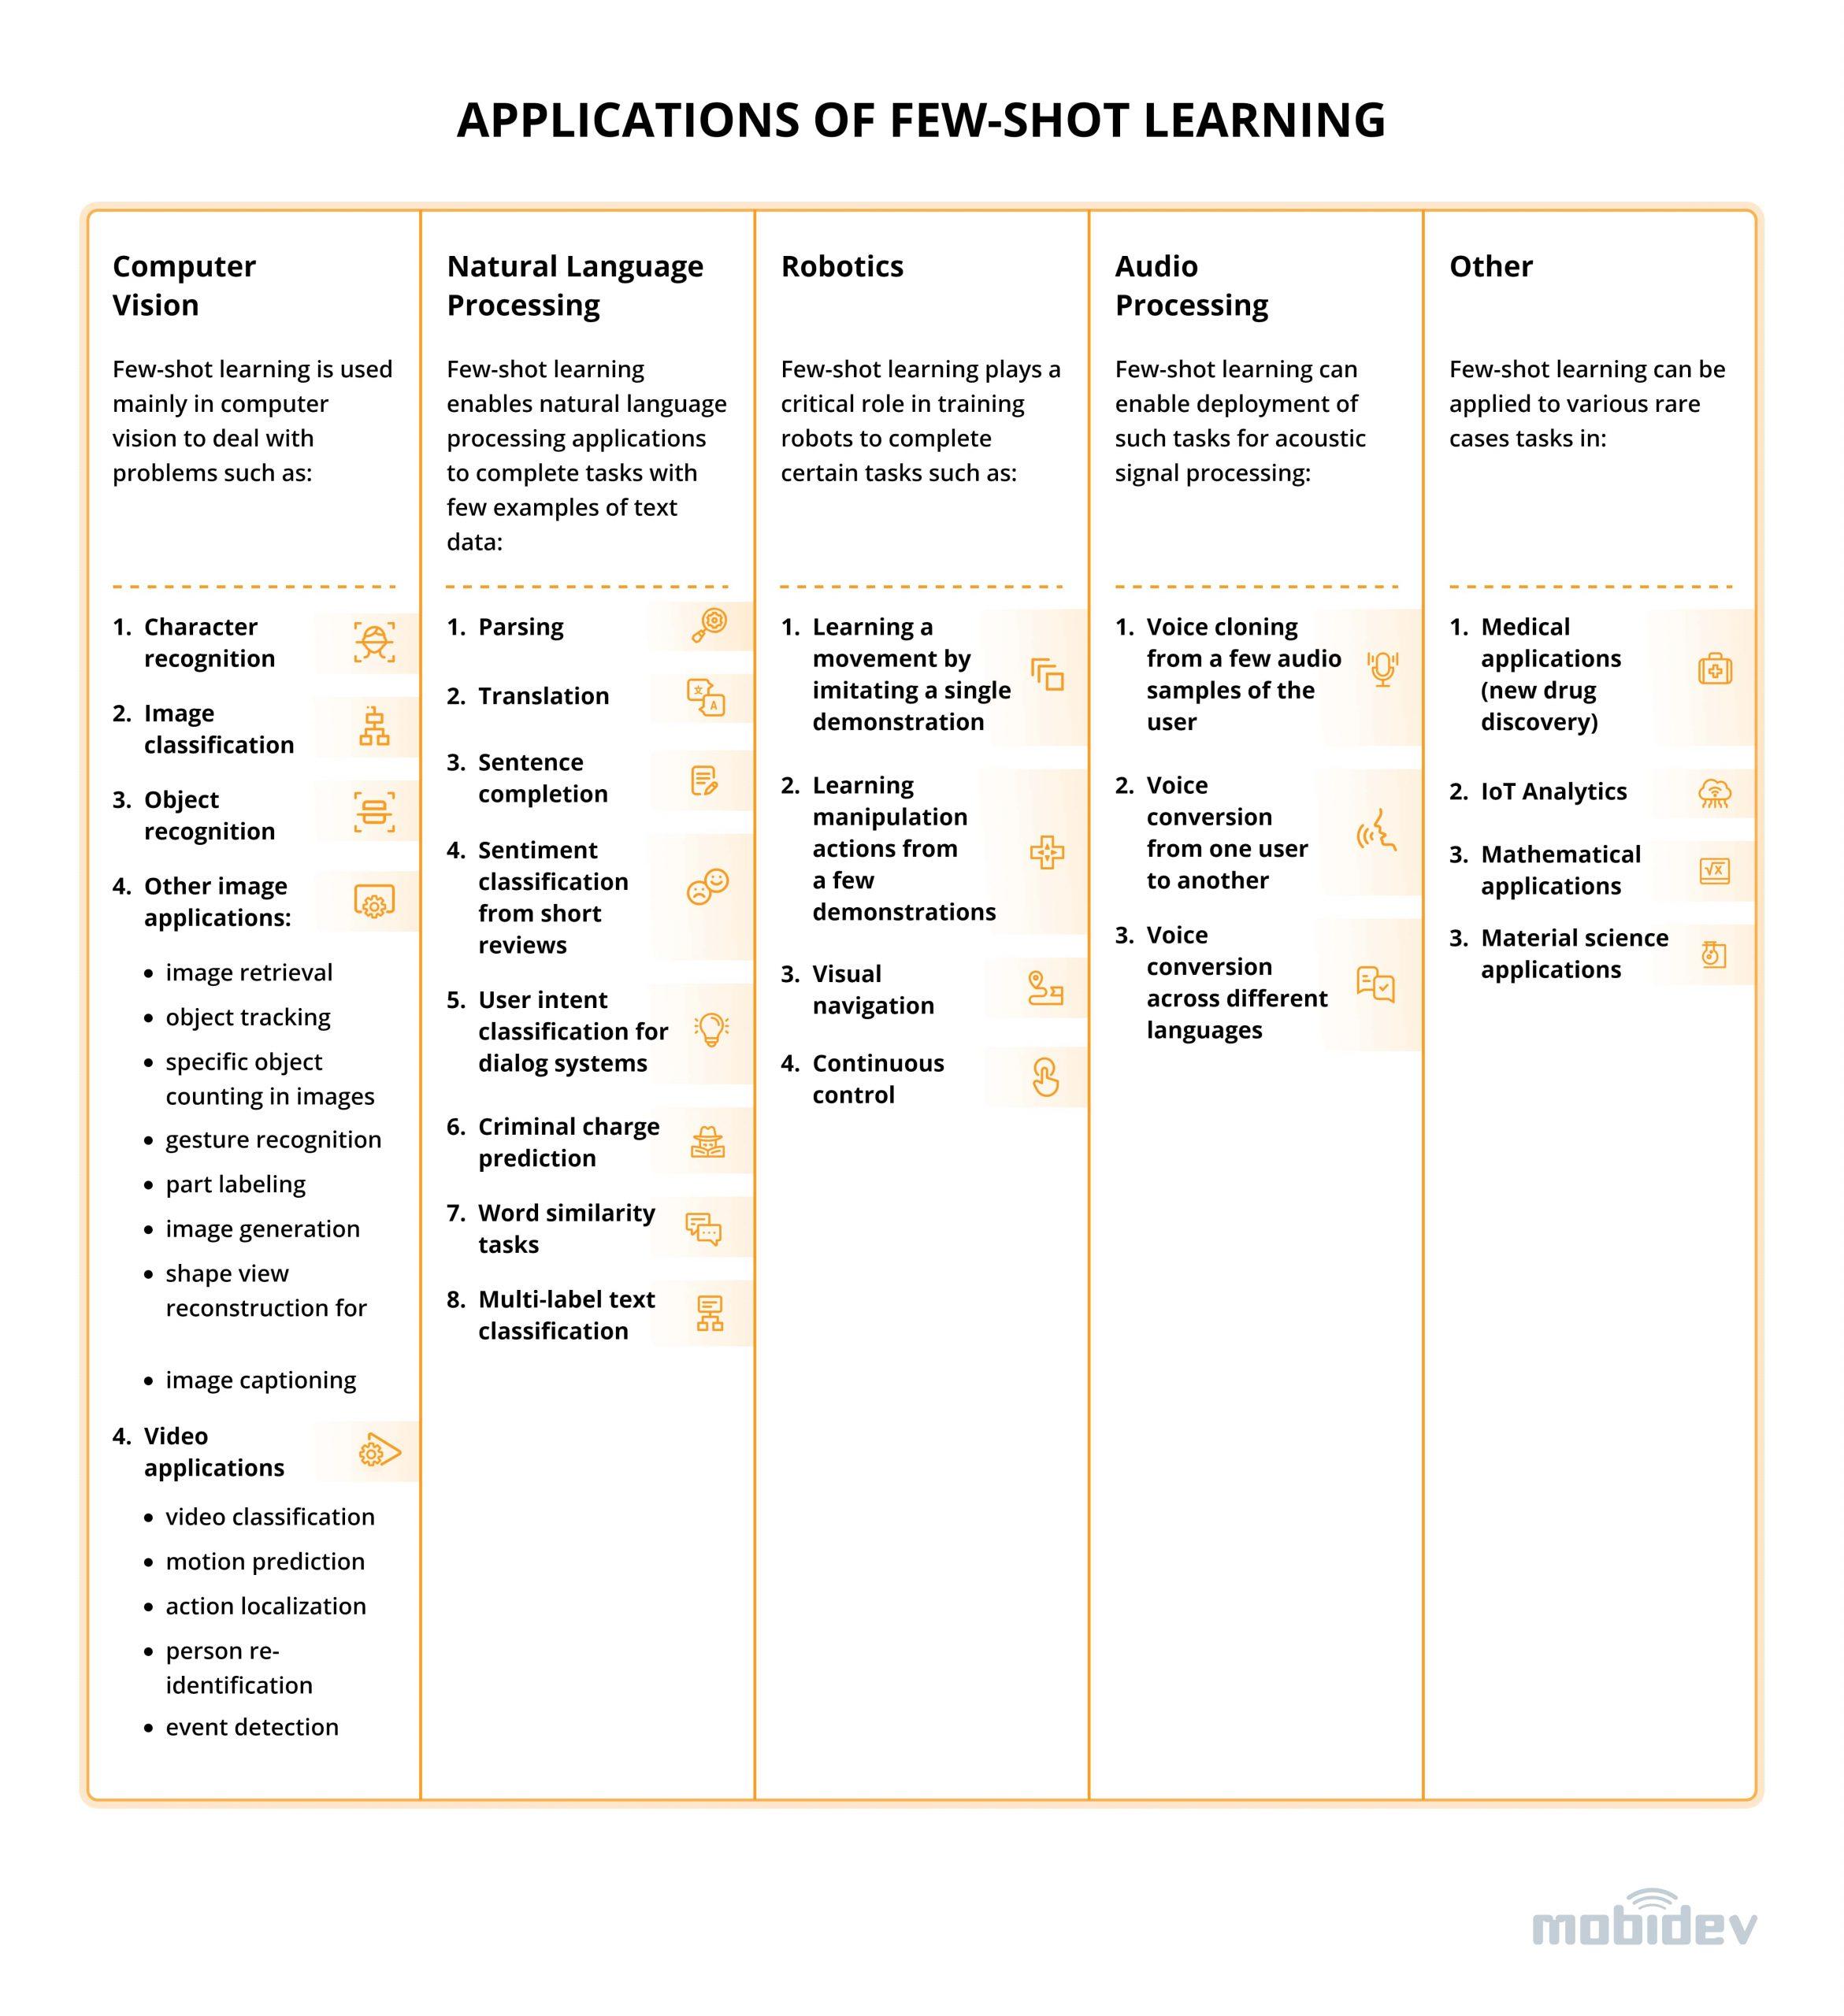 Applications of Few-shot Learning